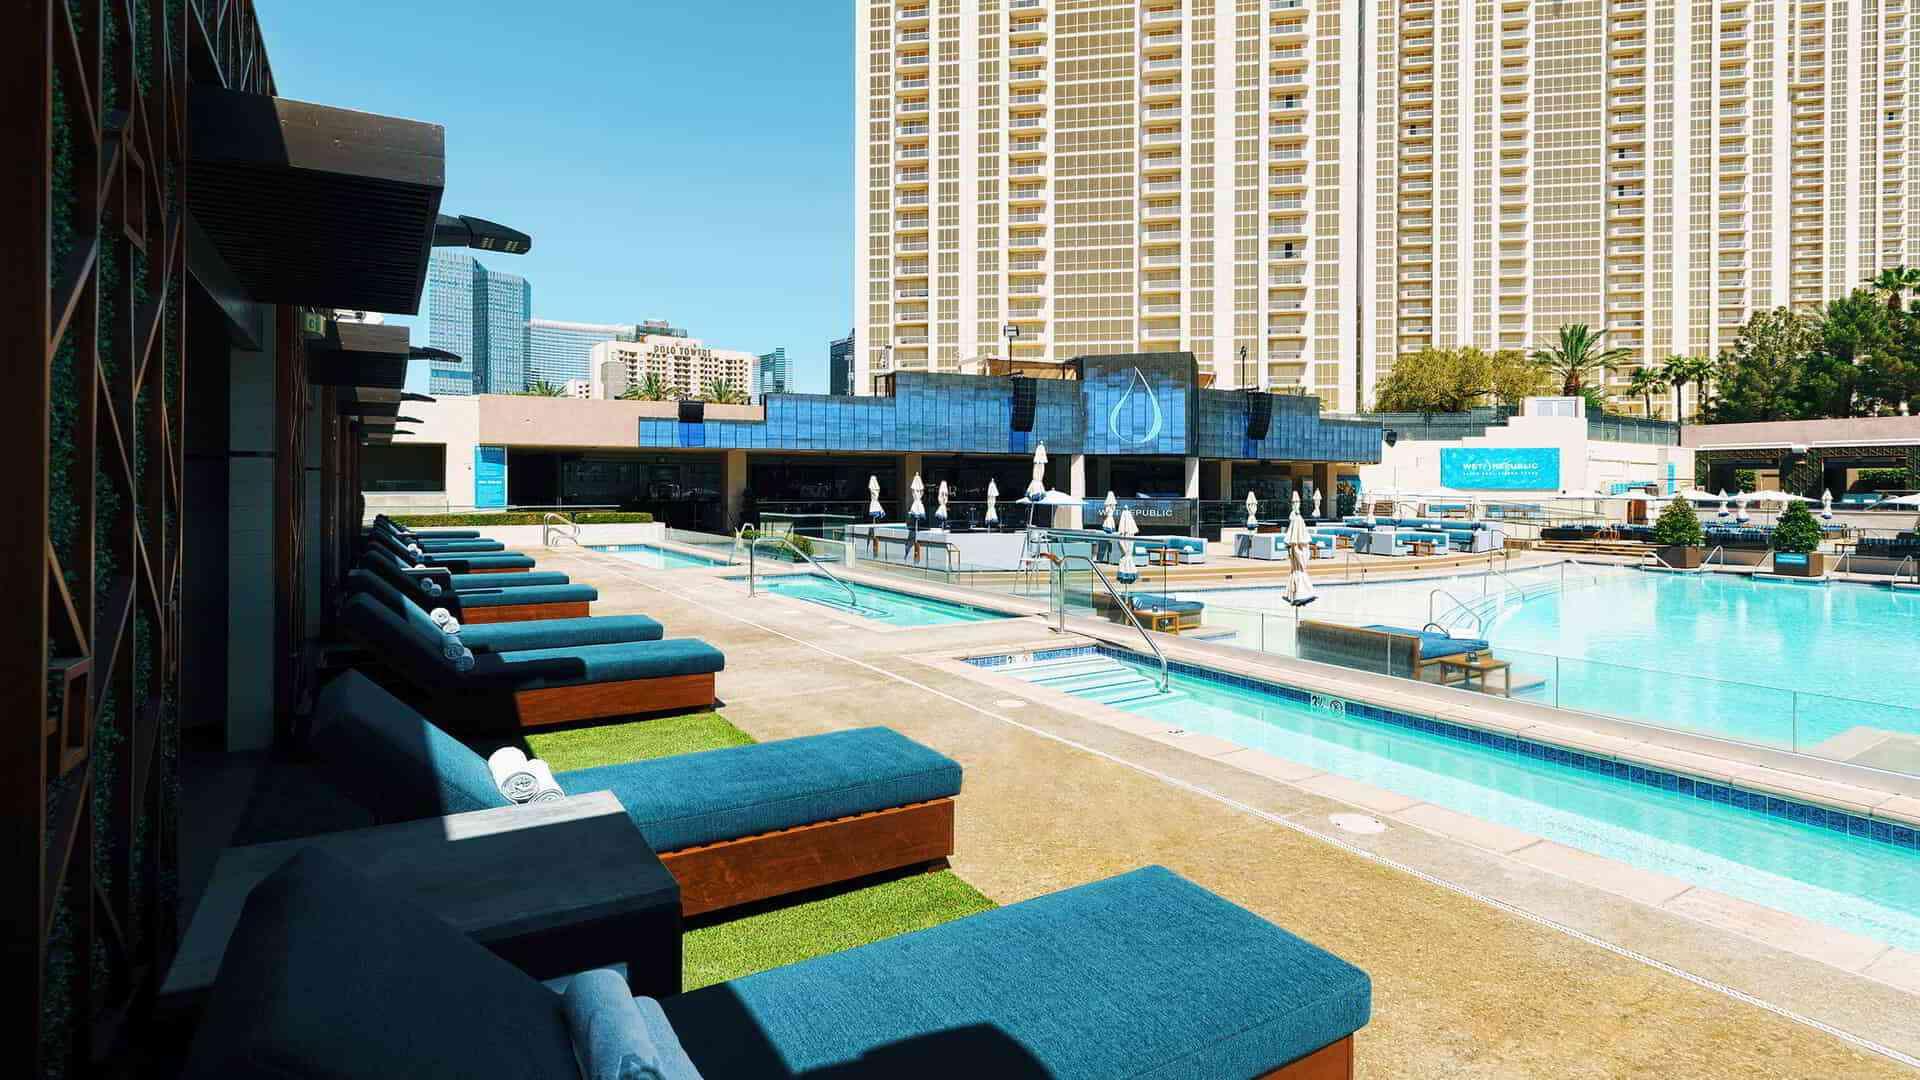 dark teal pool chairs nexts to a large pool in MGM Grand resort Las Vegas